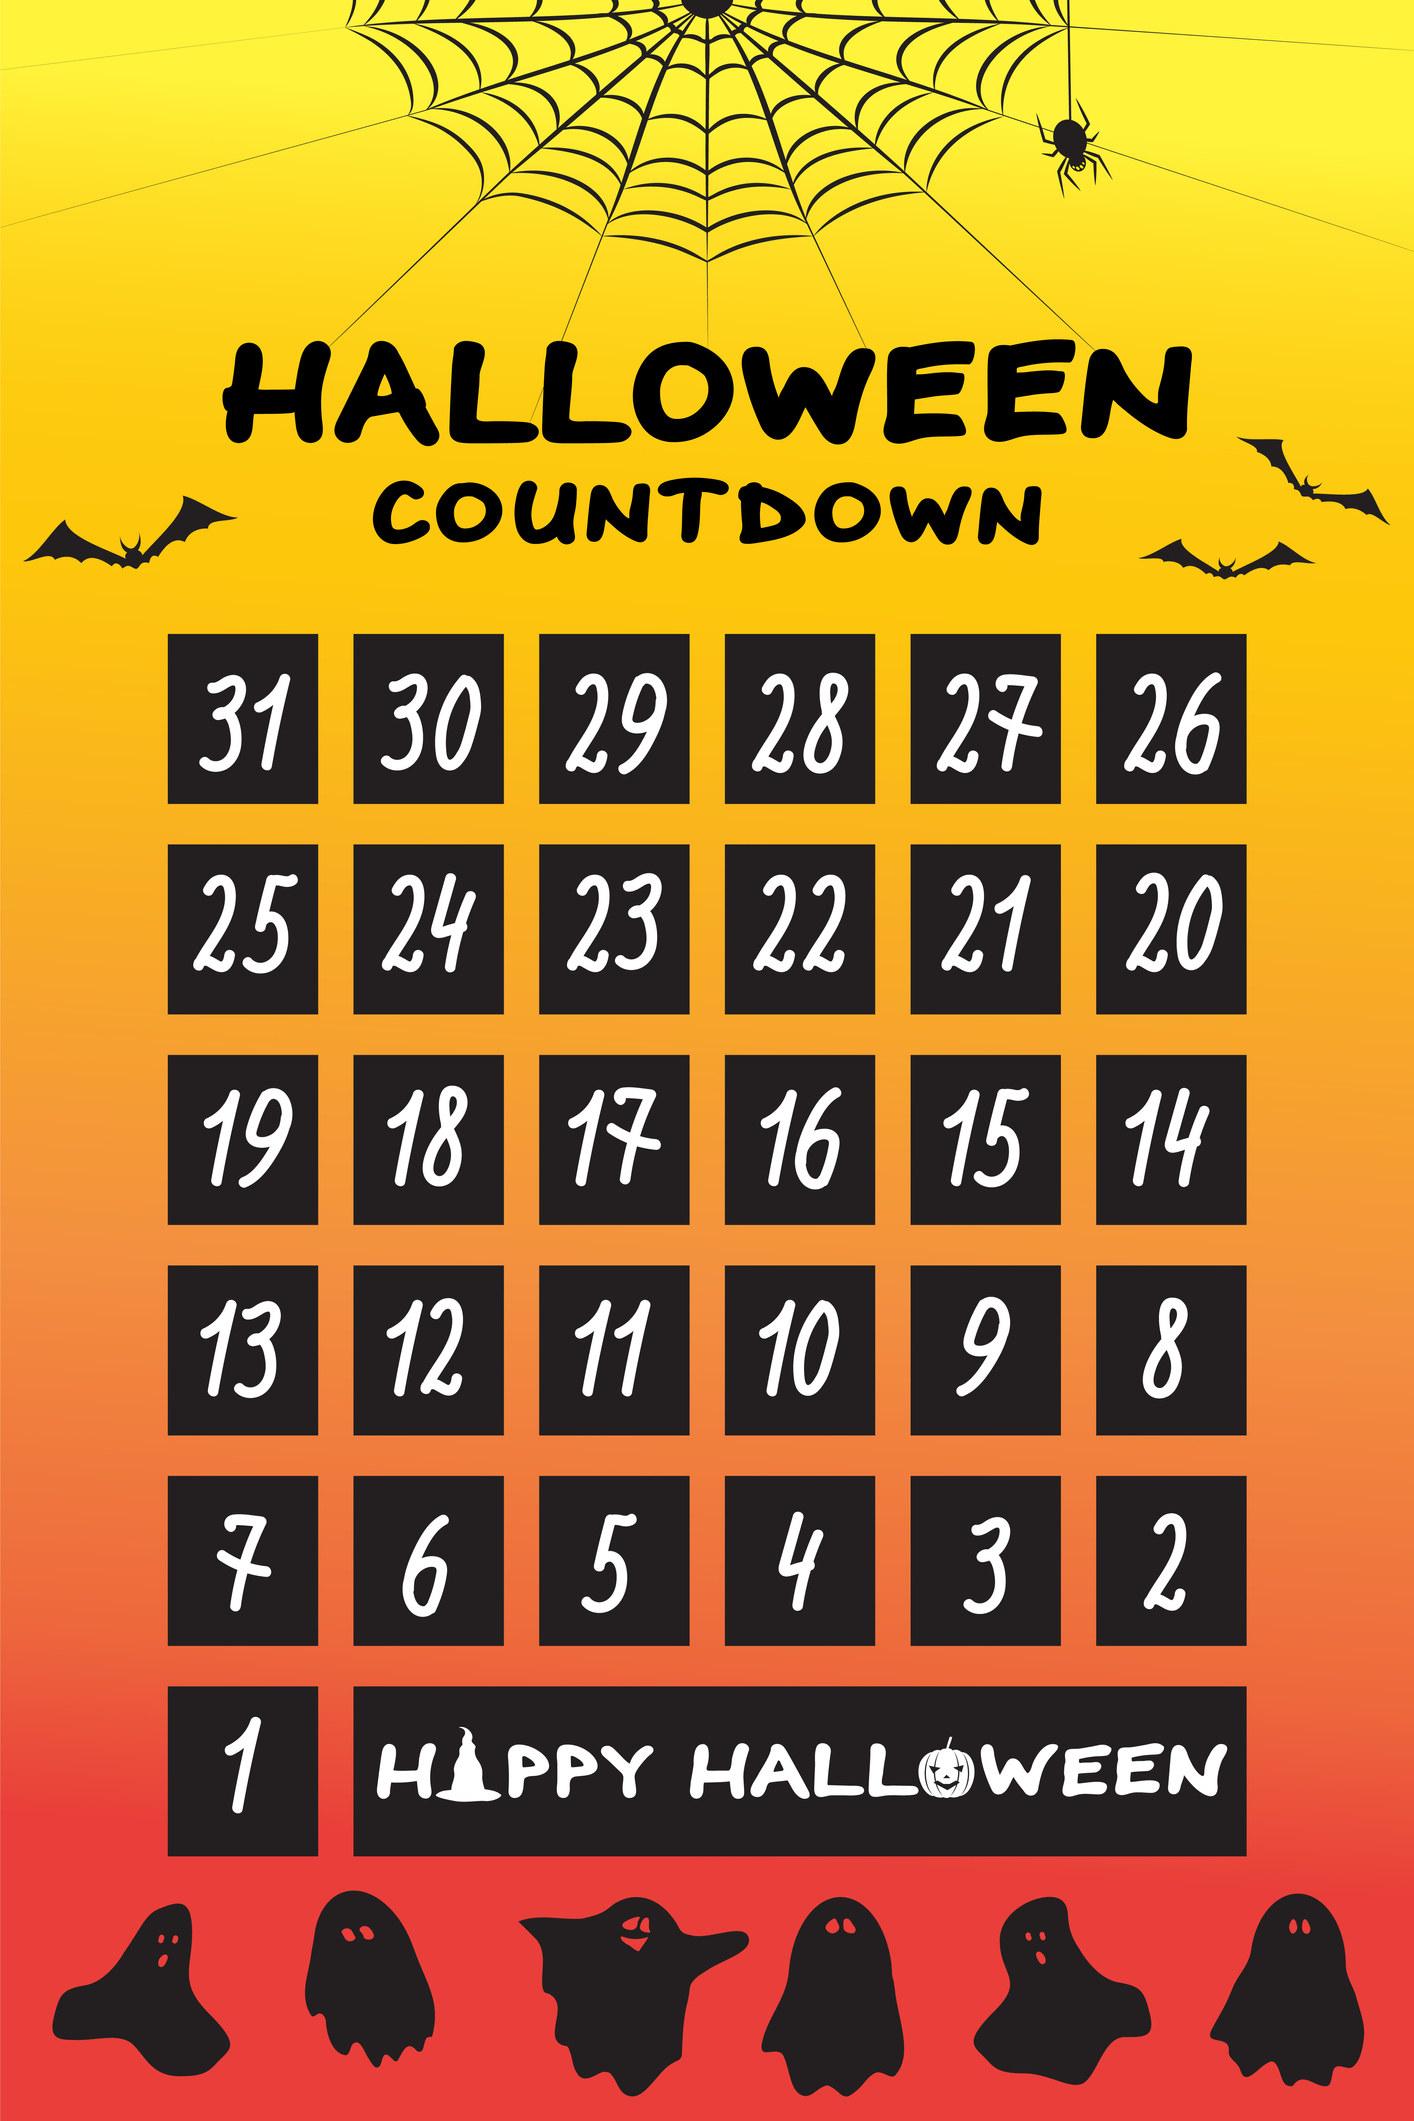 A Halloween countdown calendar.